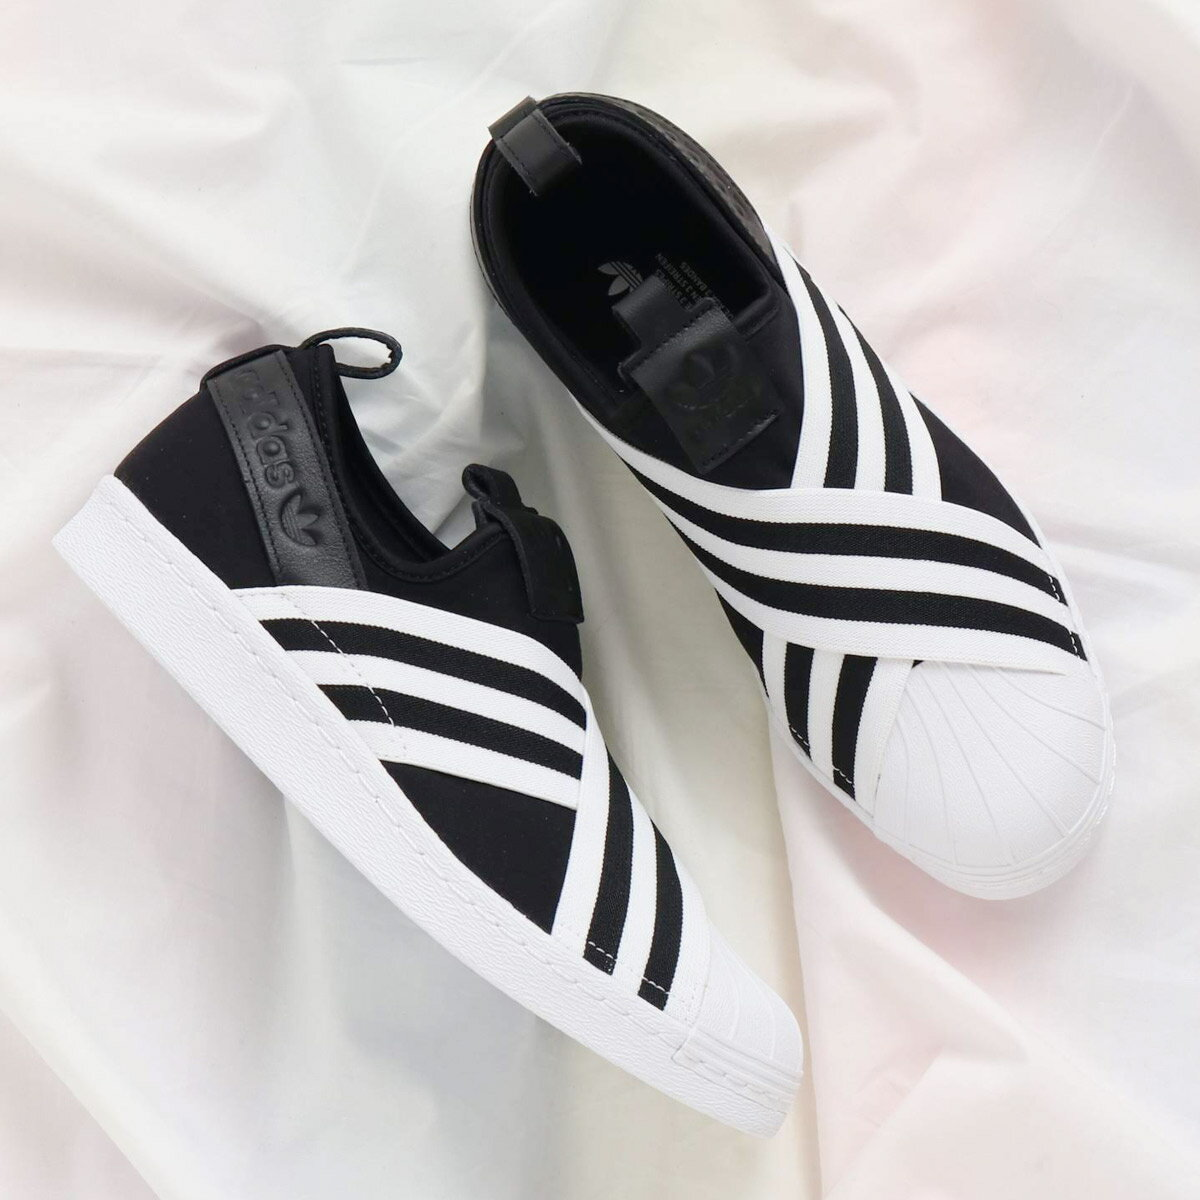 adidas Originals SUPERSTAR SLIPON W(アディダス オリジナルス スーパースタースリッポン W) Core Black/Running White/Running White18SS-I